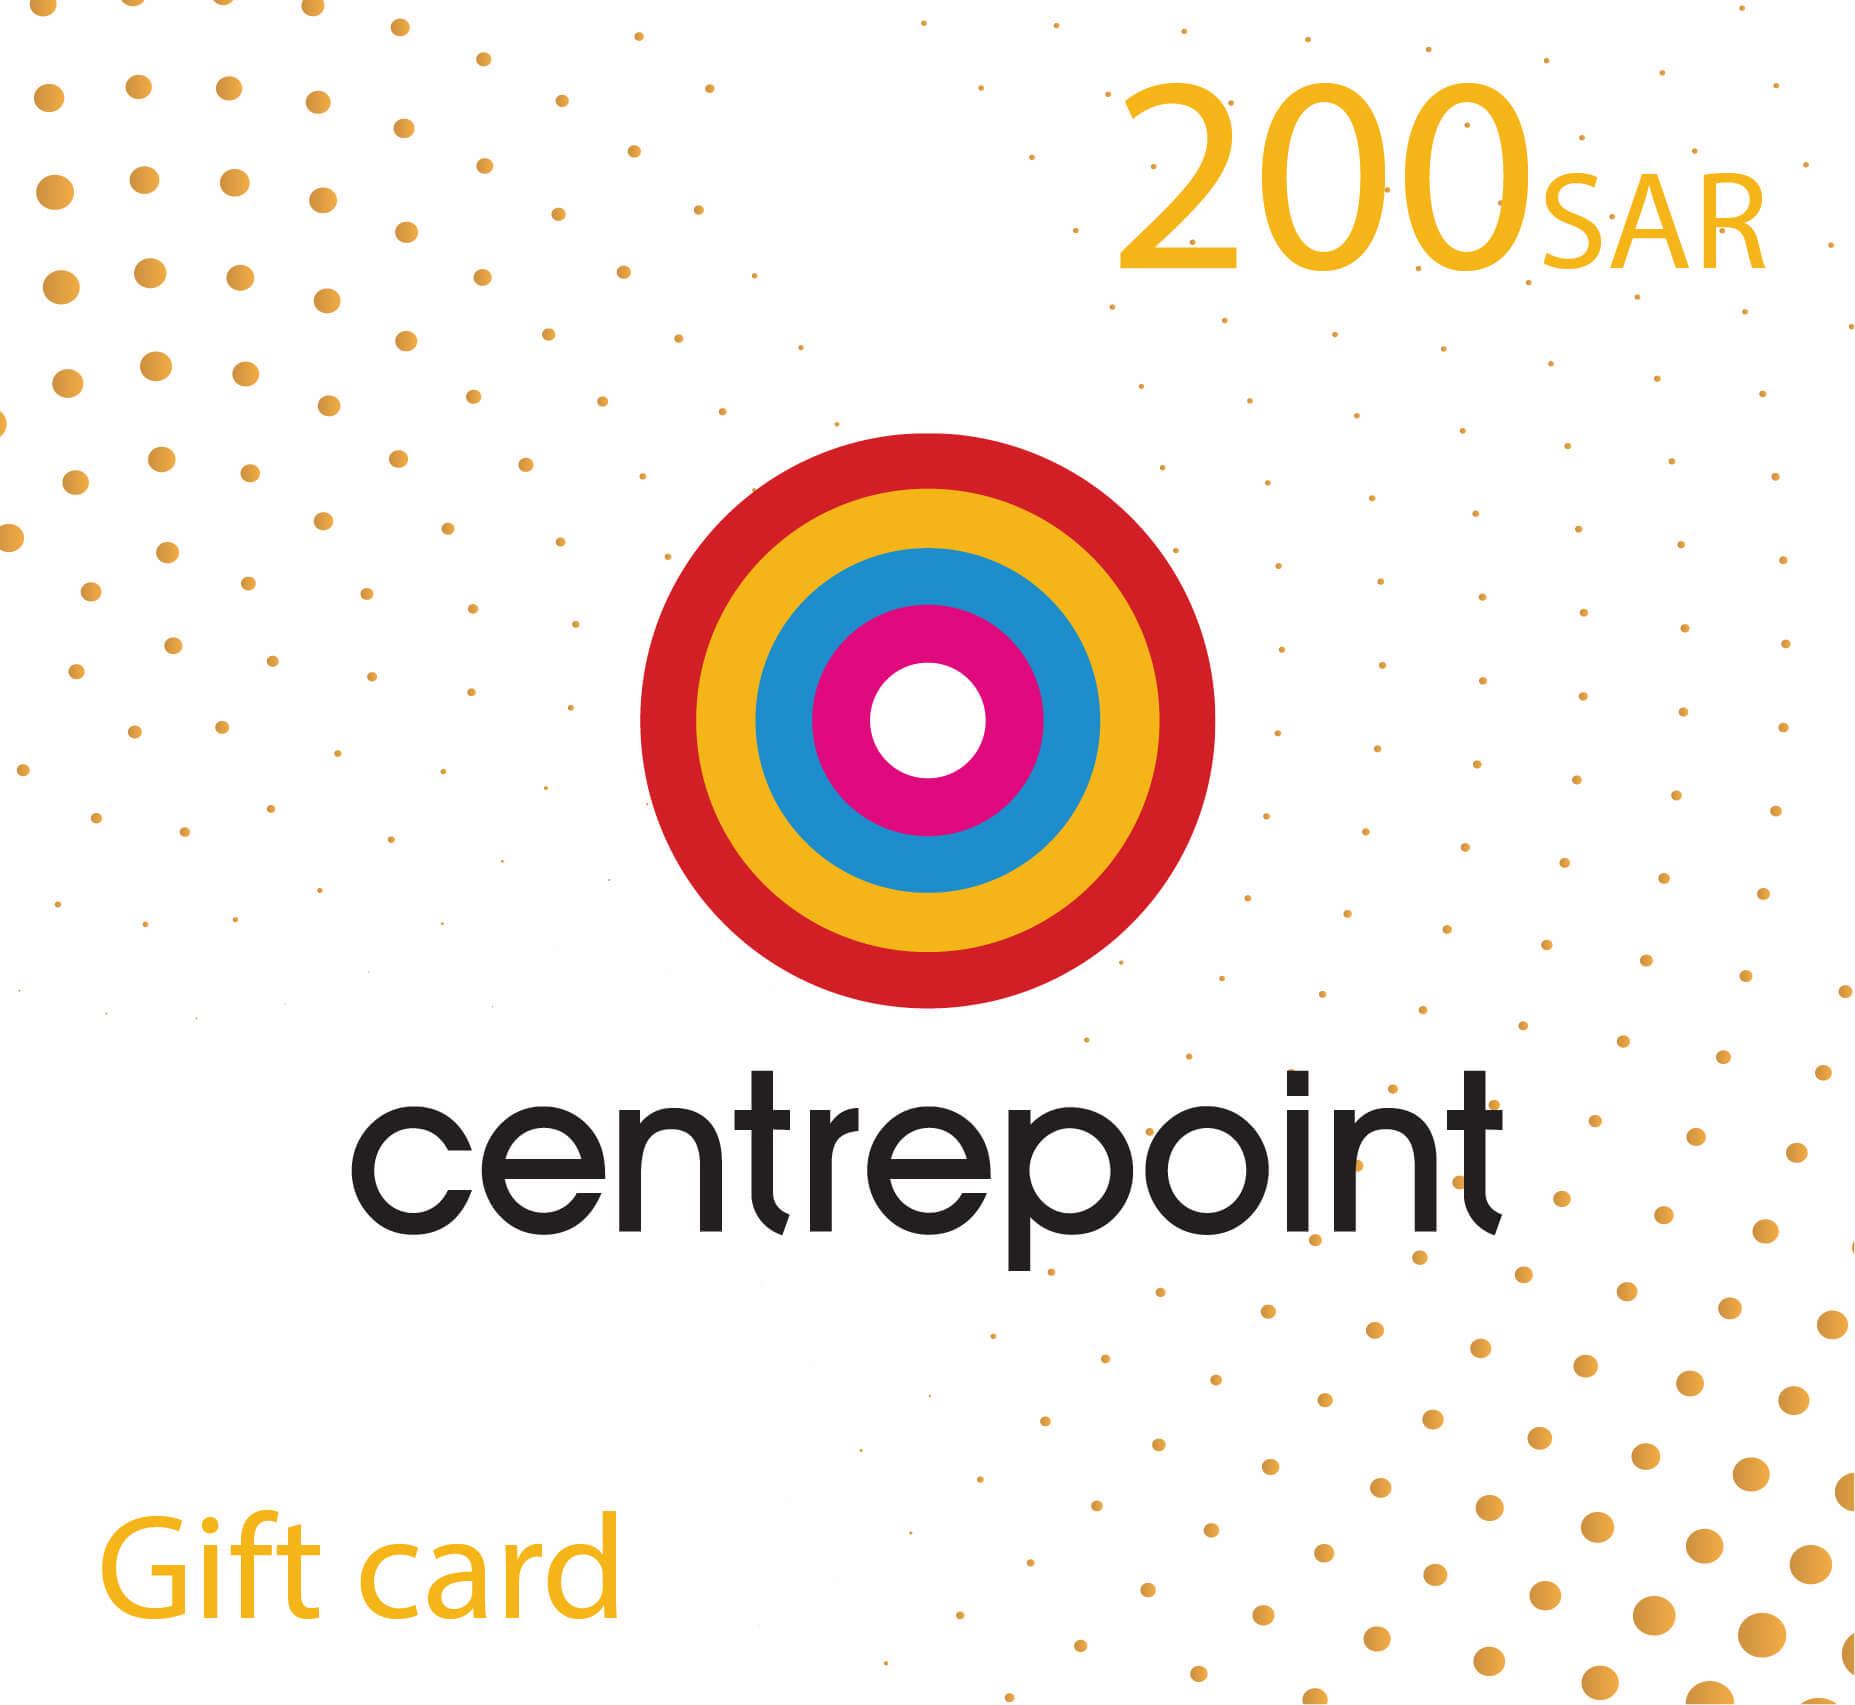 CentrePoint Gift Card - 200 SAR